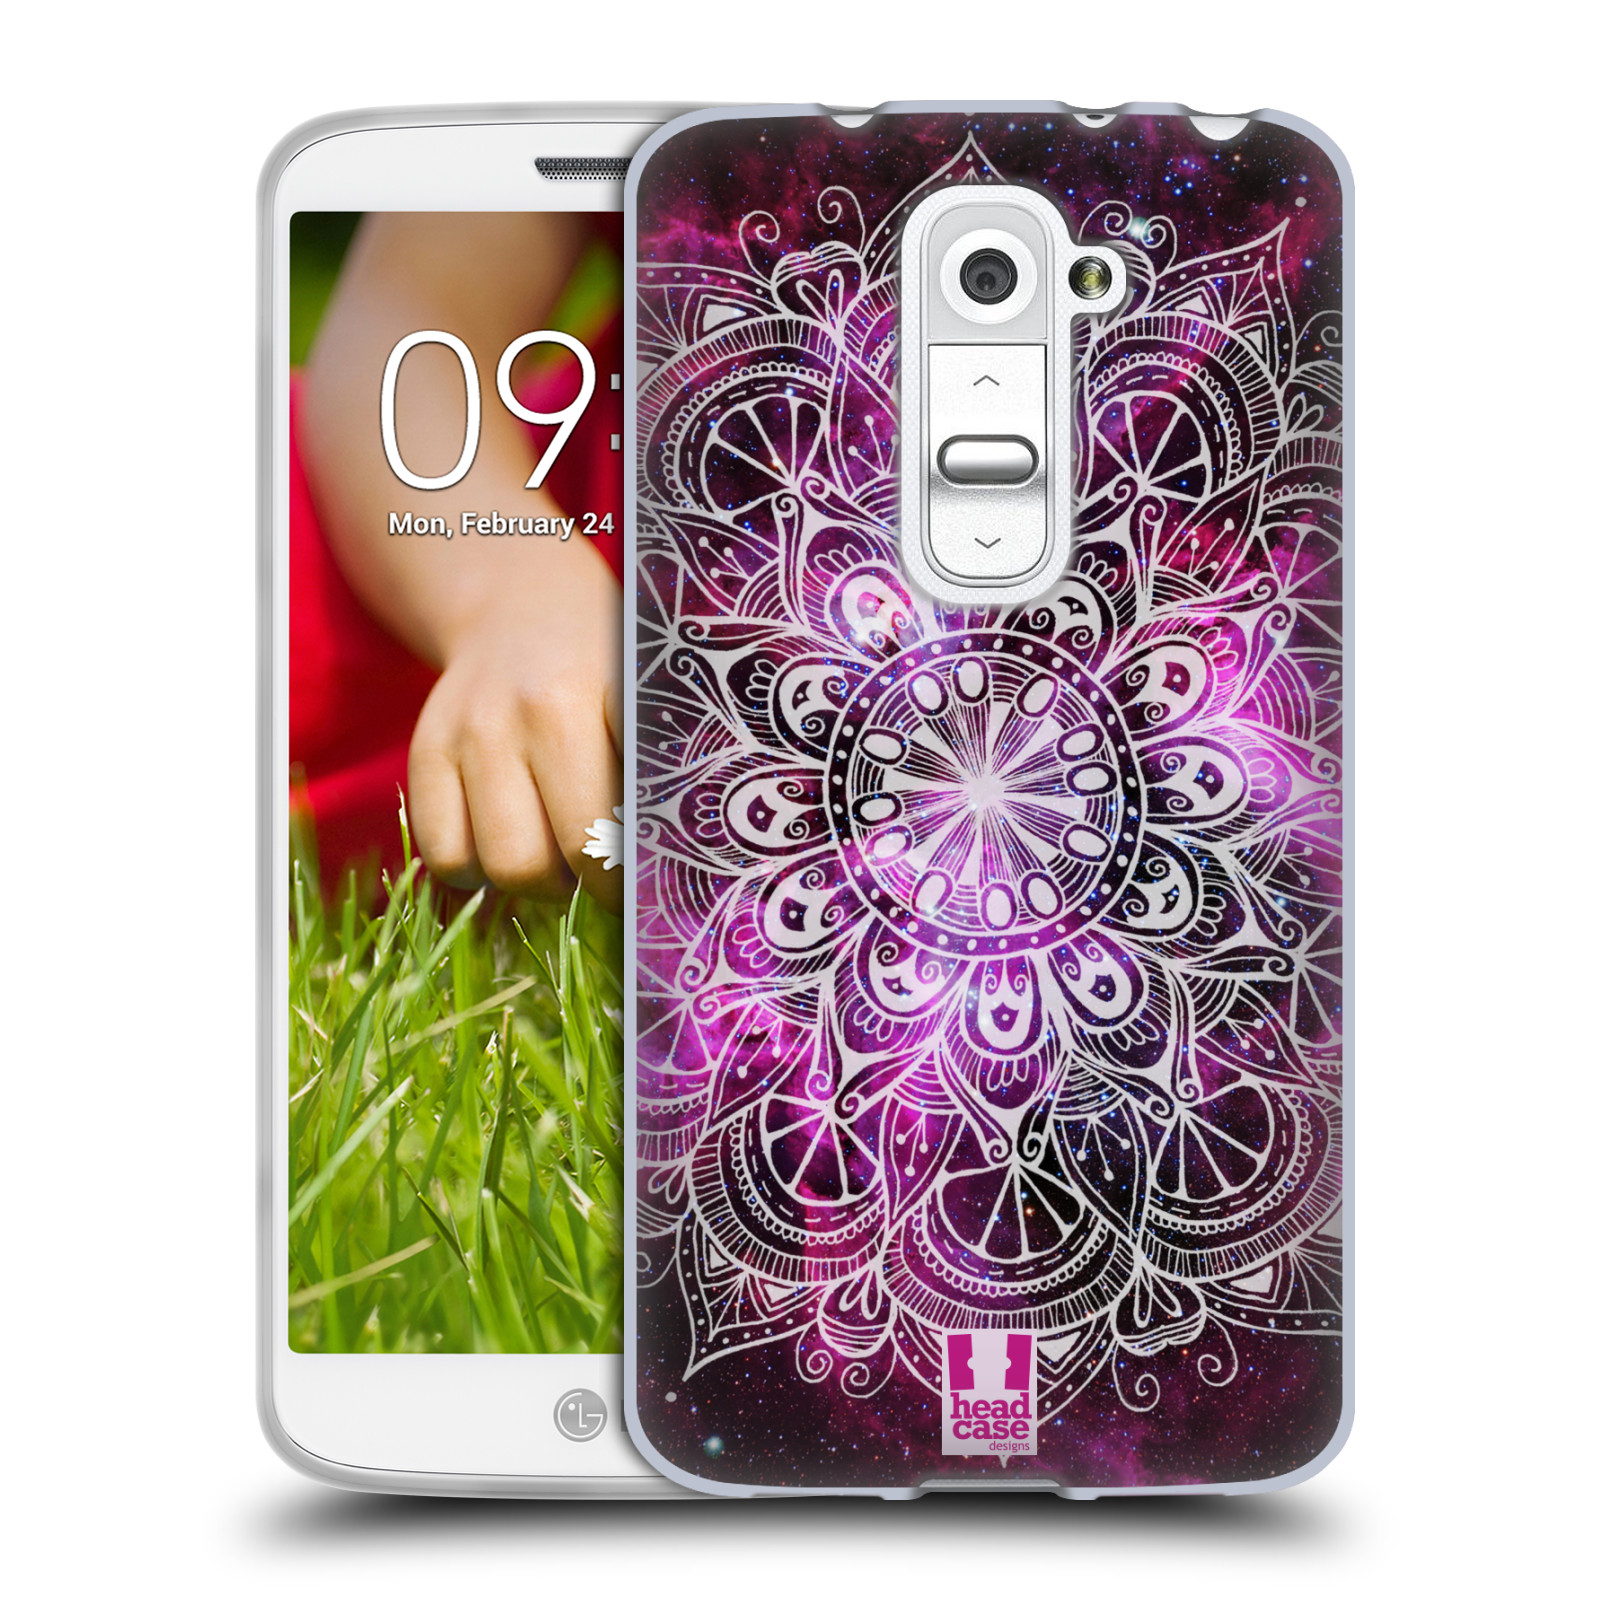 Silikonové pouzdro na mobil LG G2 Mini HEAD CASE Mandala Doodle Nebula (Silikonový kryt či obal na mobilní telefon LG G2 Mini D620)